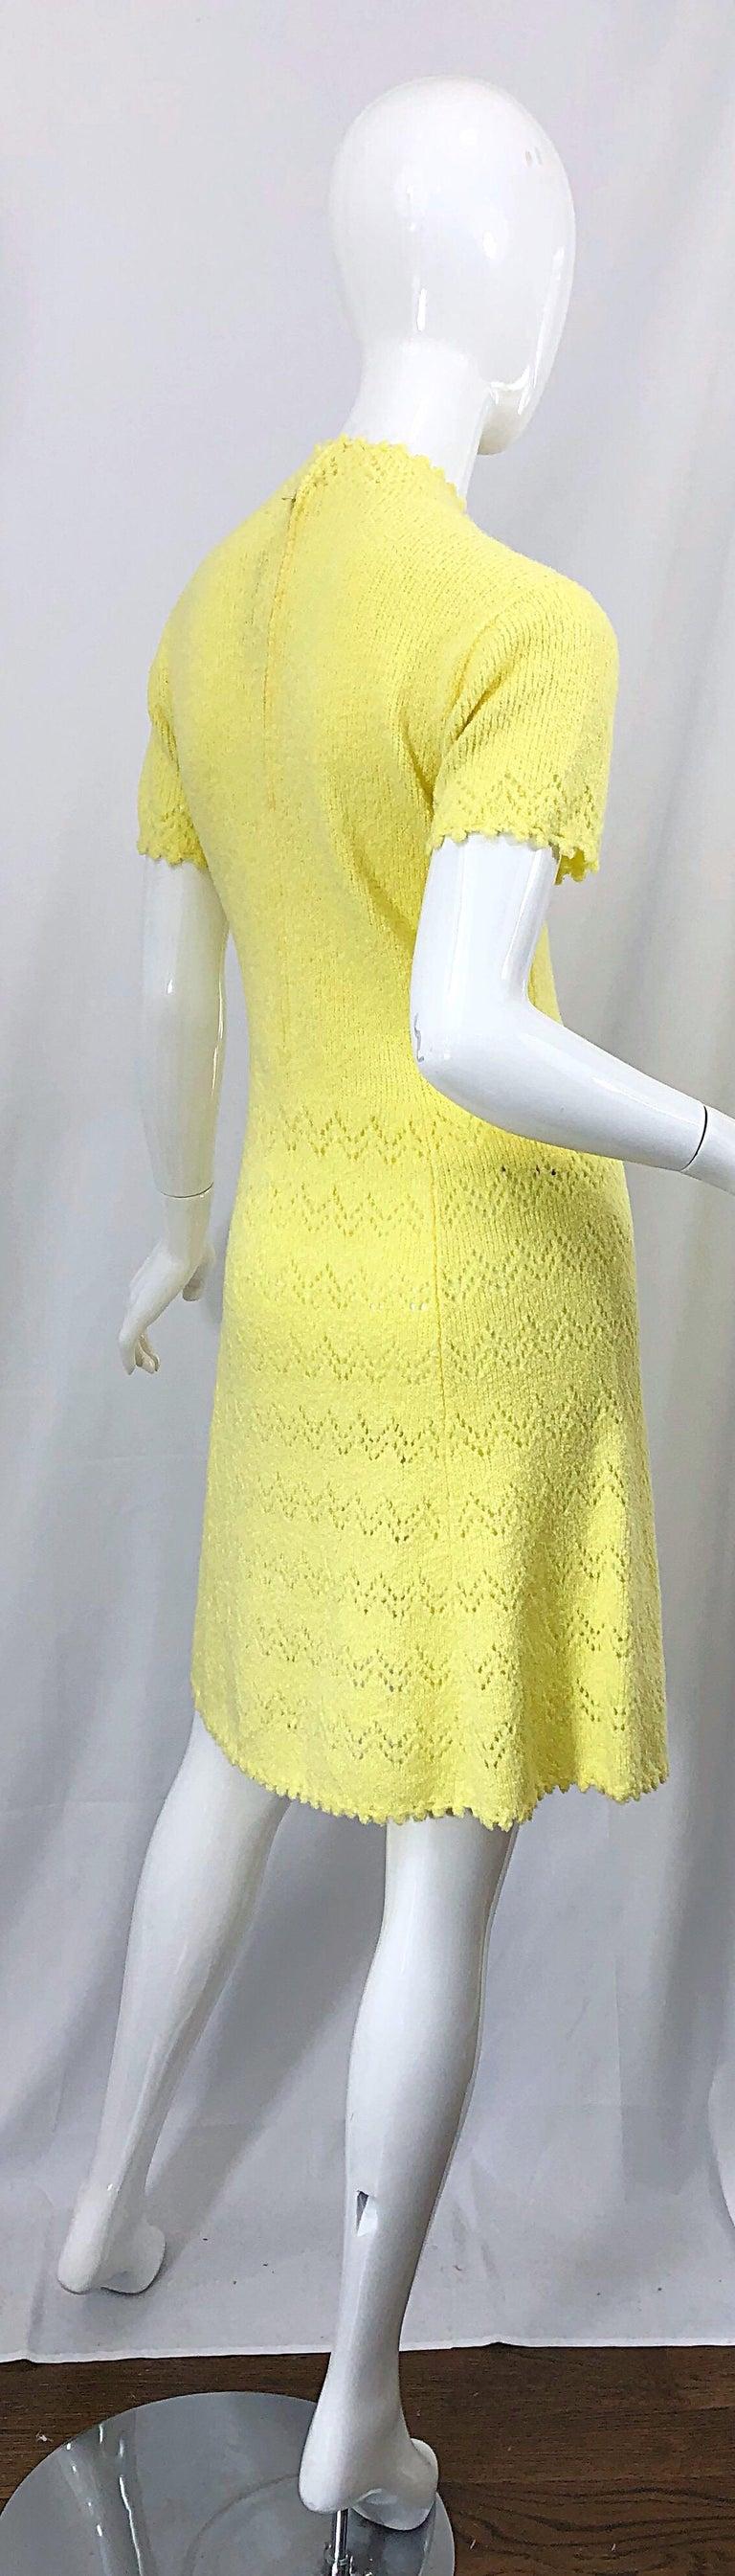 1960s St John Canary Yellow Santana Knit Mod Crochet Vintage A Line 60s Dress For Sale 8